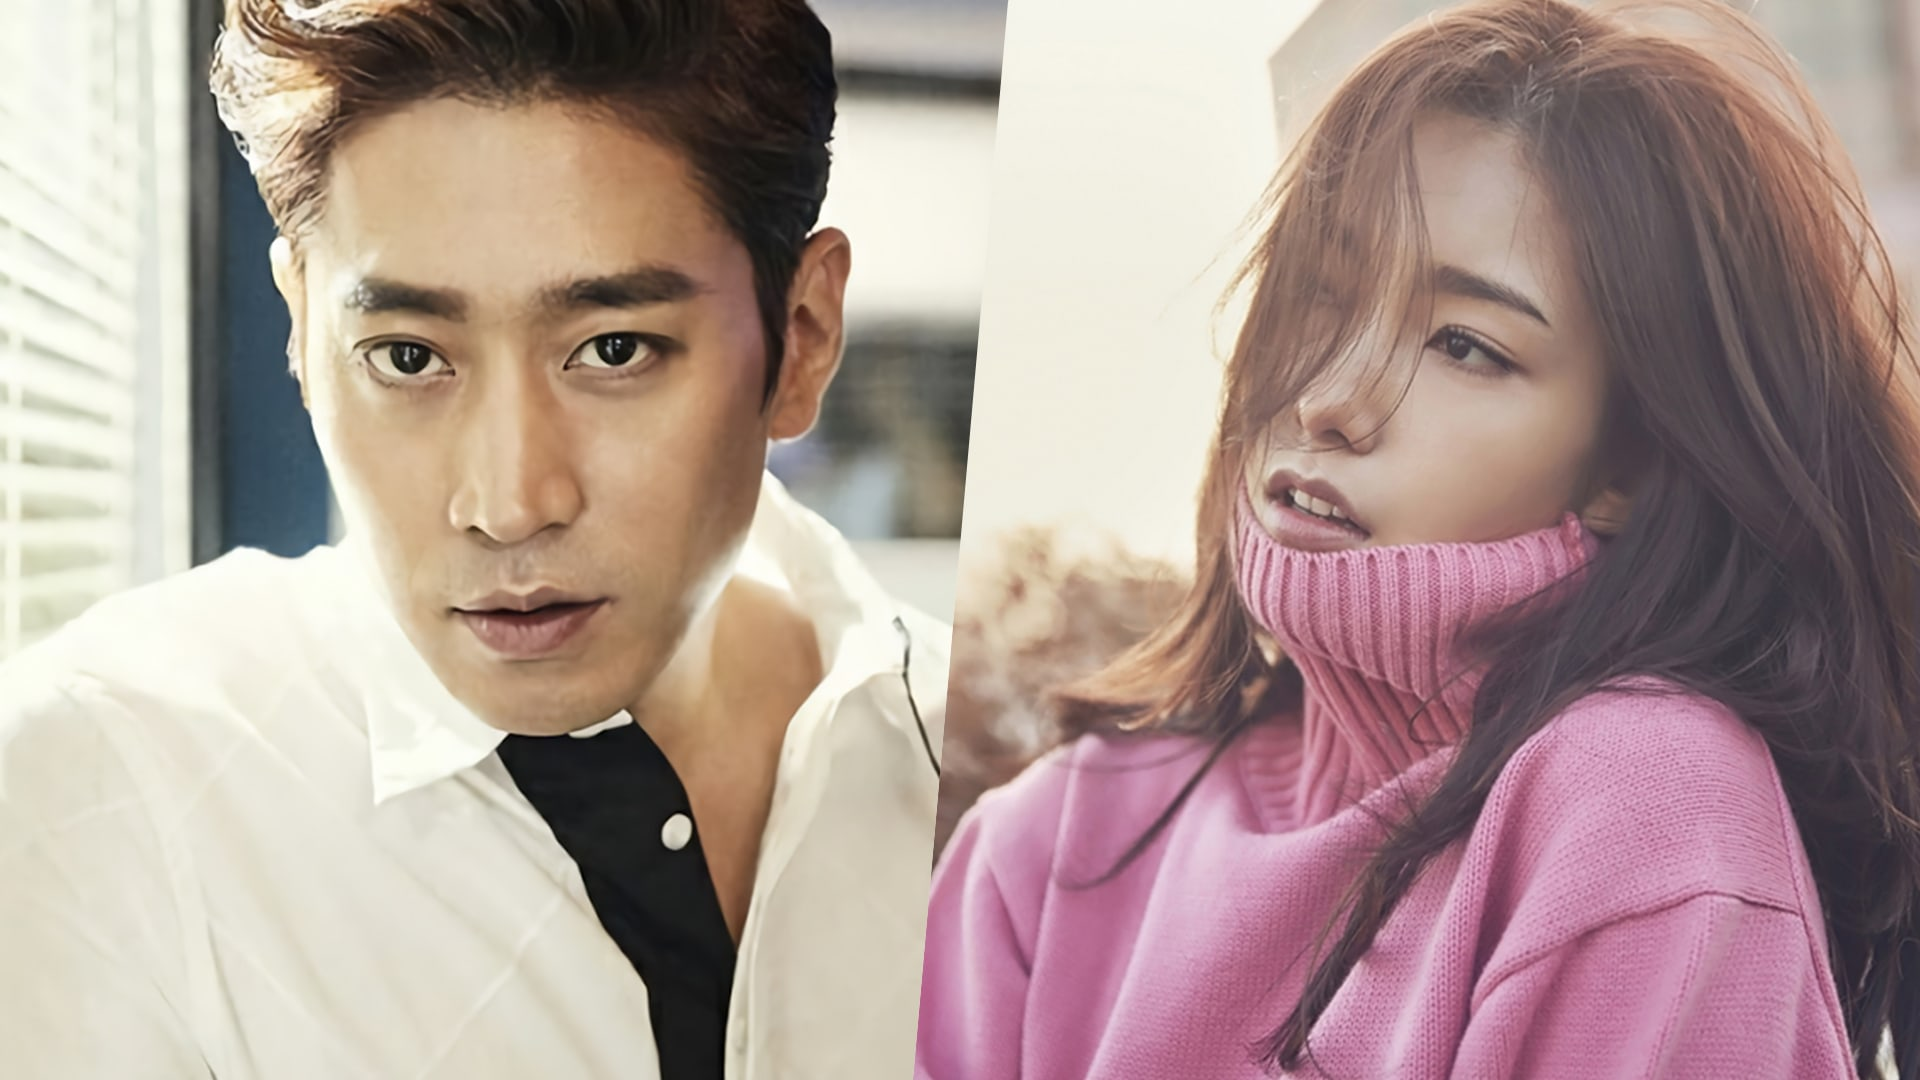 Eric de Shinhwa habla sobre su matrimonio con la actriz Na Hye Mi